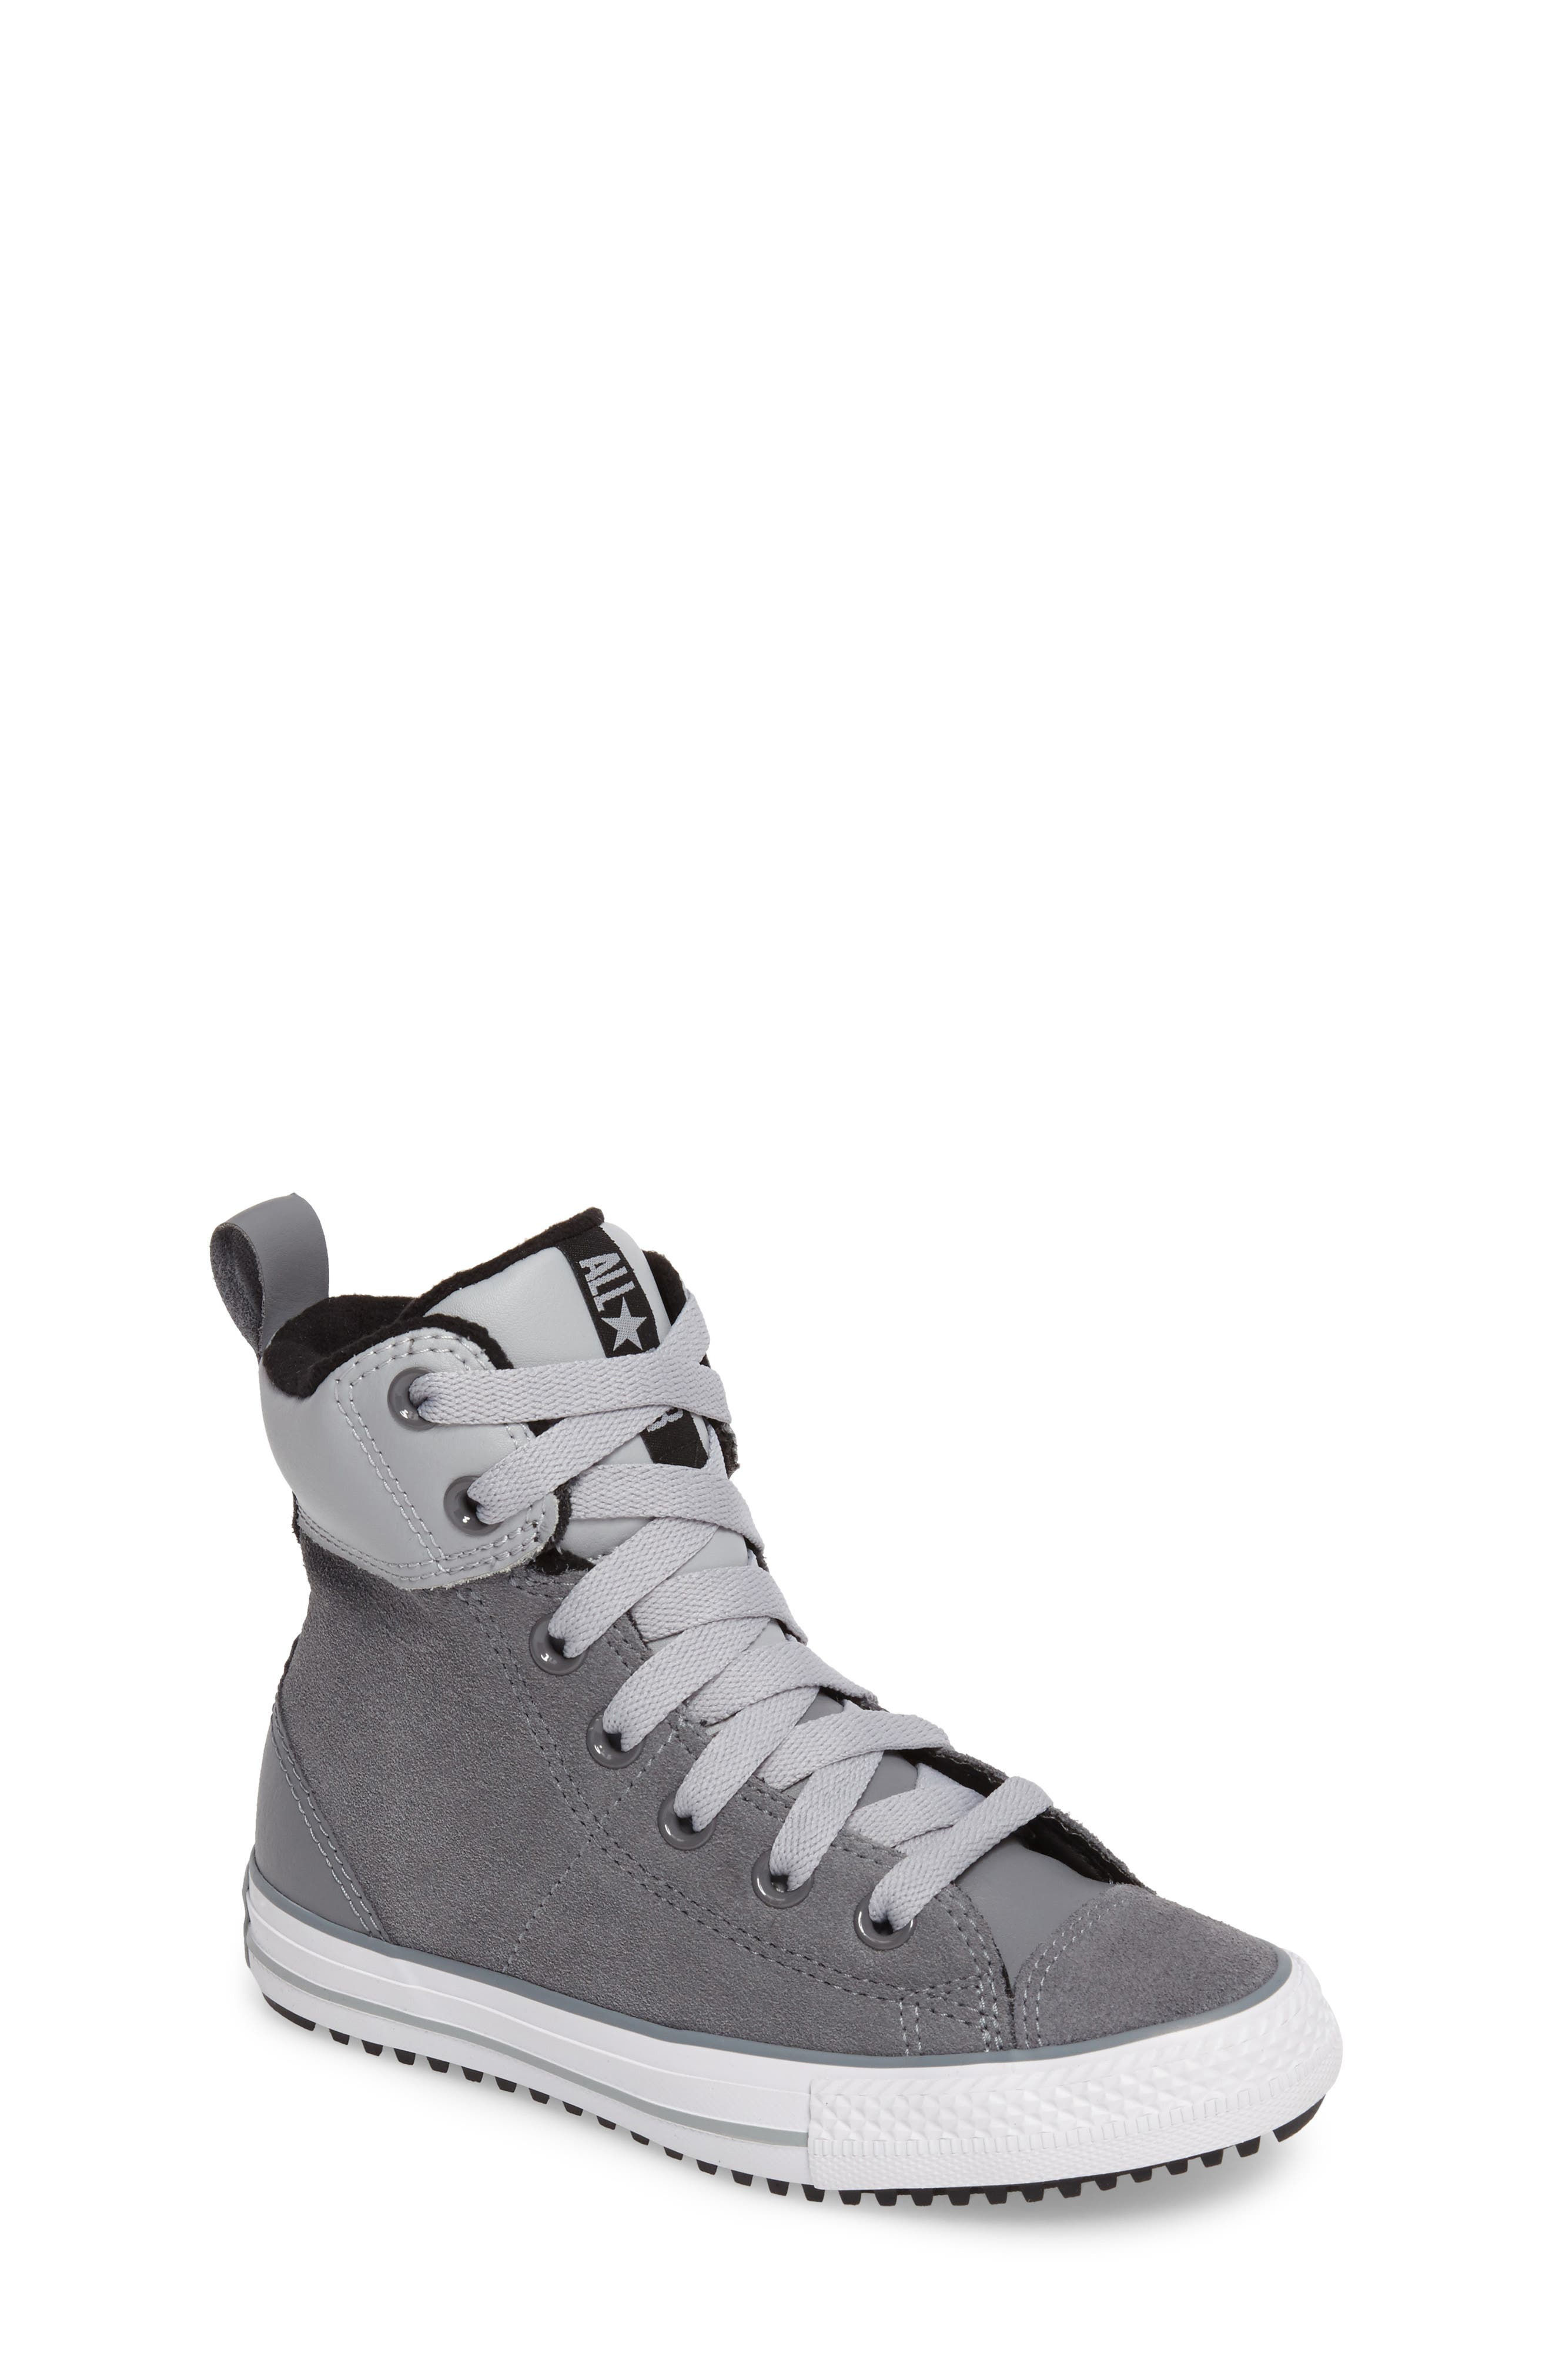 Converse Chuck Taylor® All Star® Asphalt Sneaker Boot (Toddler, Little Kid & Big Kid)